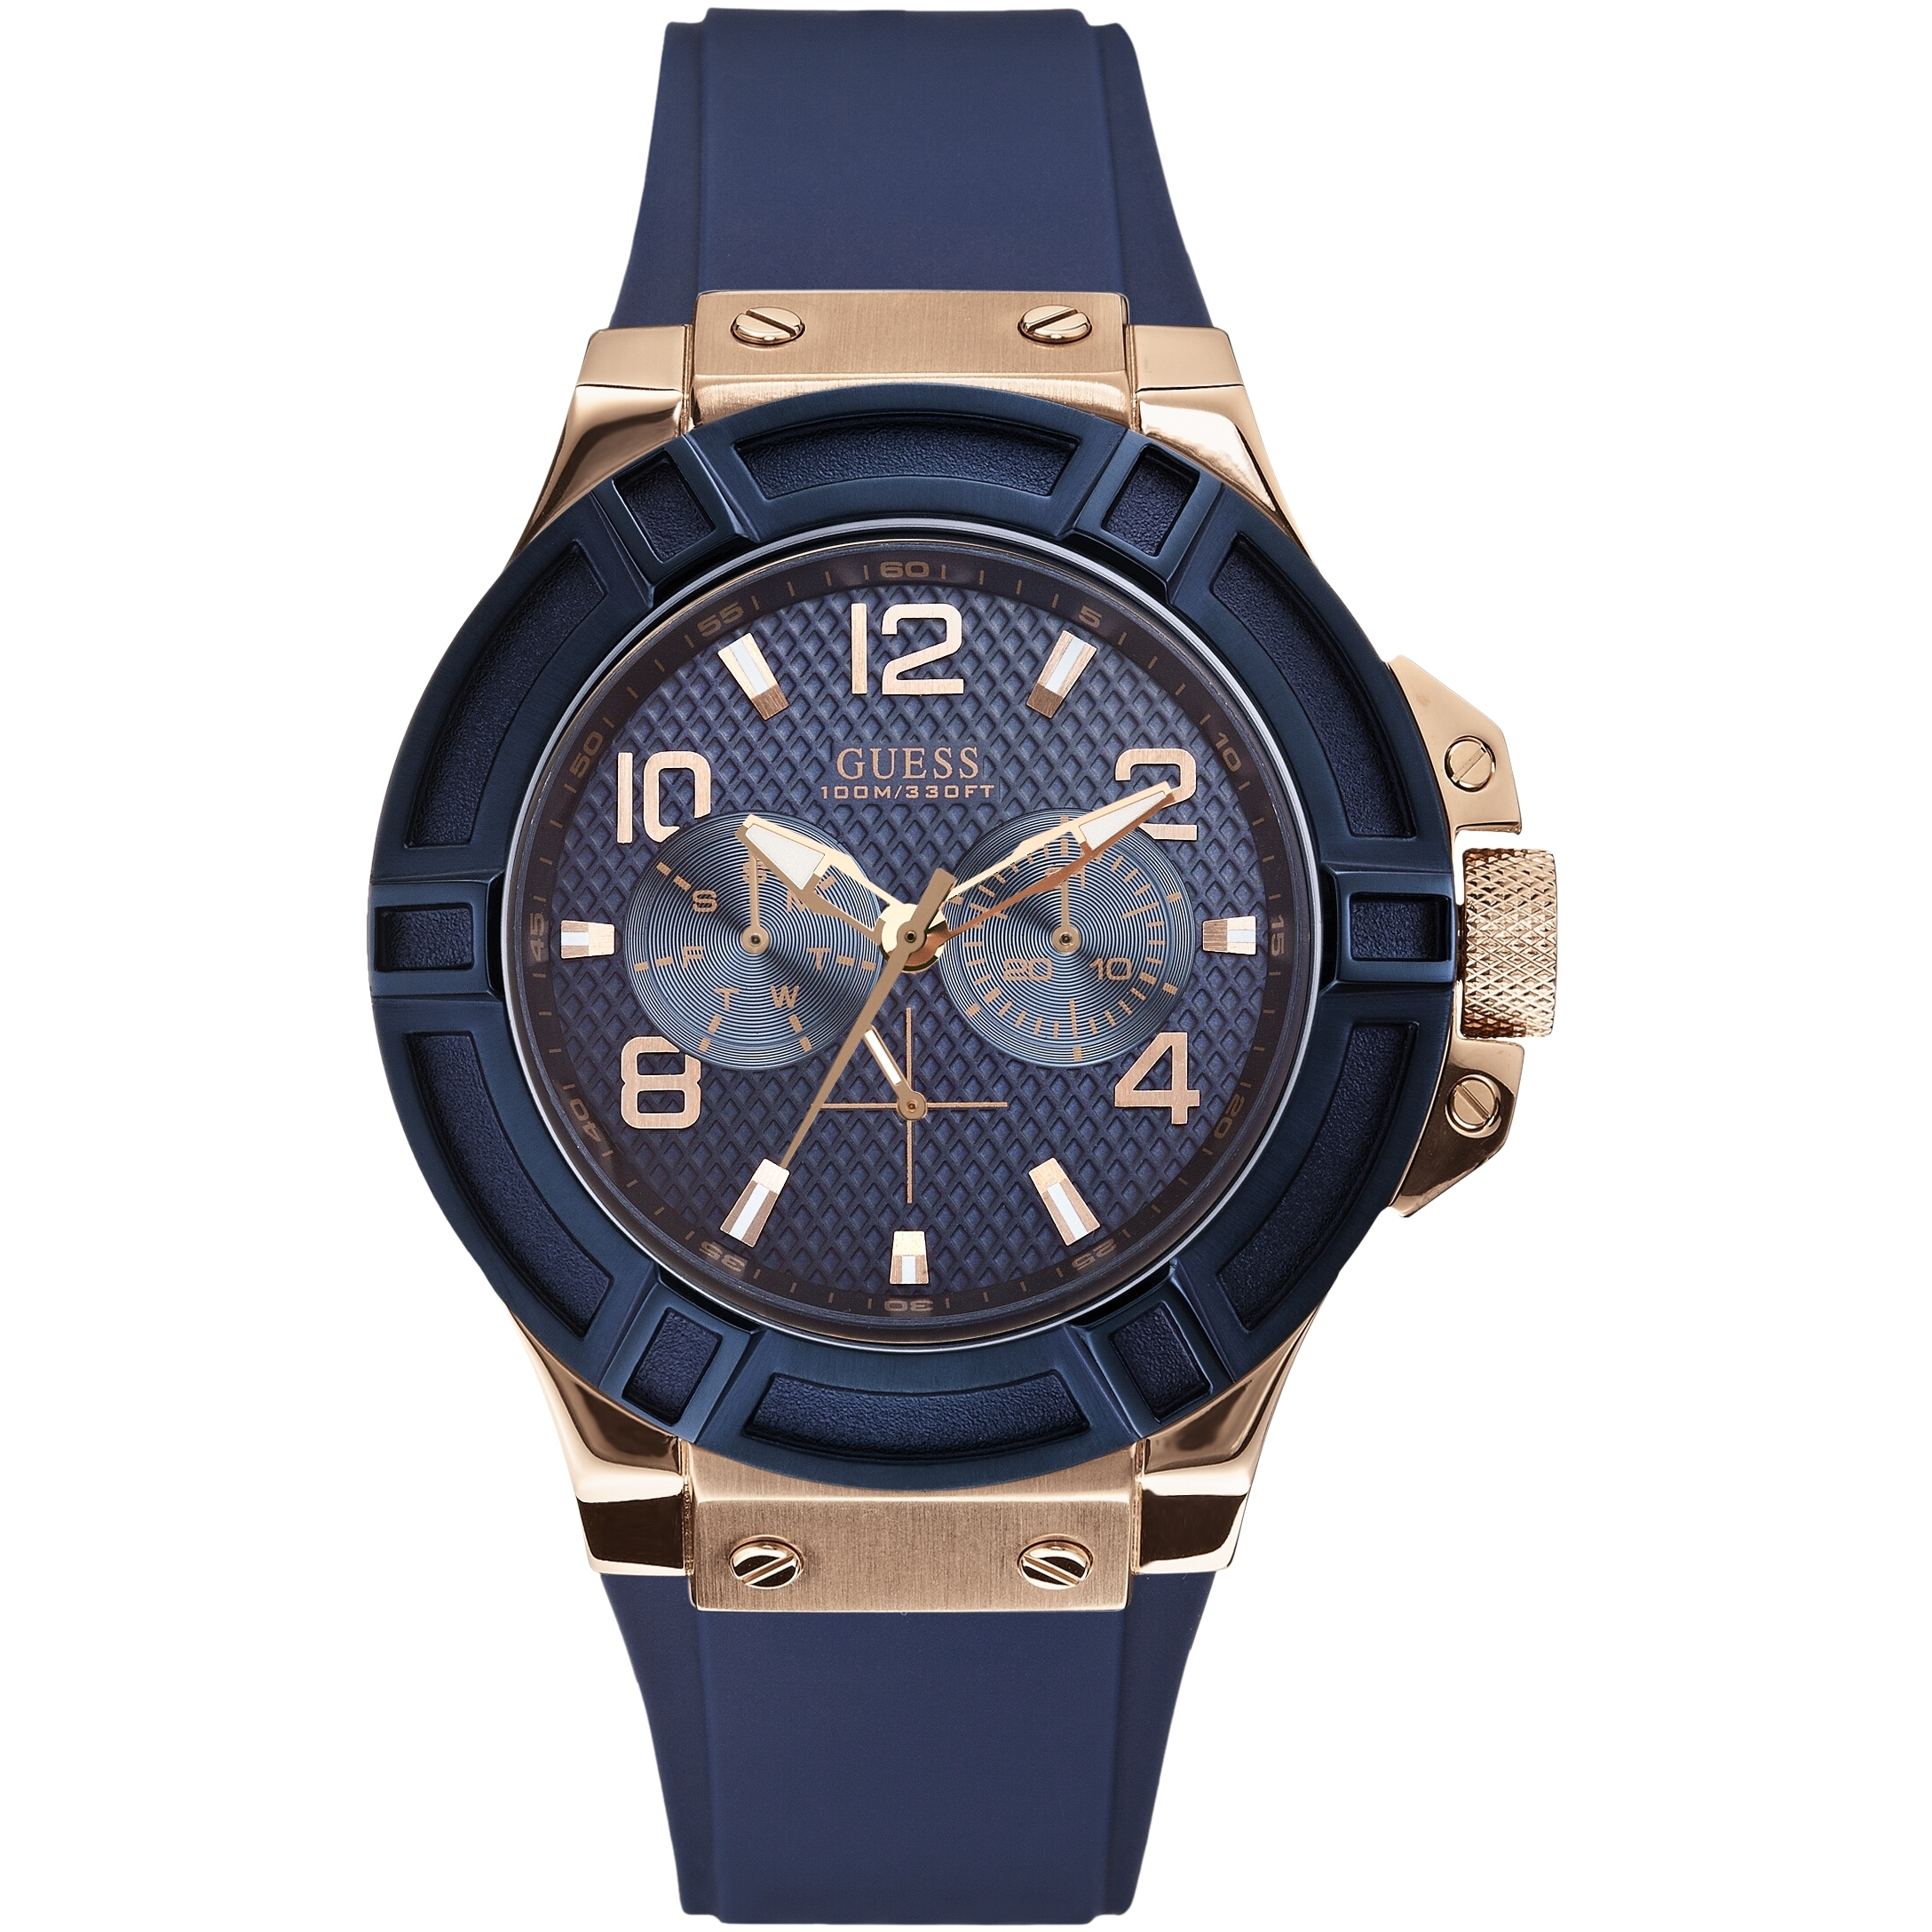 a4843f977 Gents Guess Rigor Watch (W0247G3) | WatchShop.com™